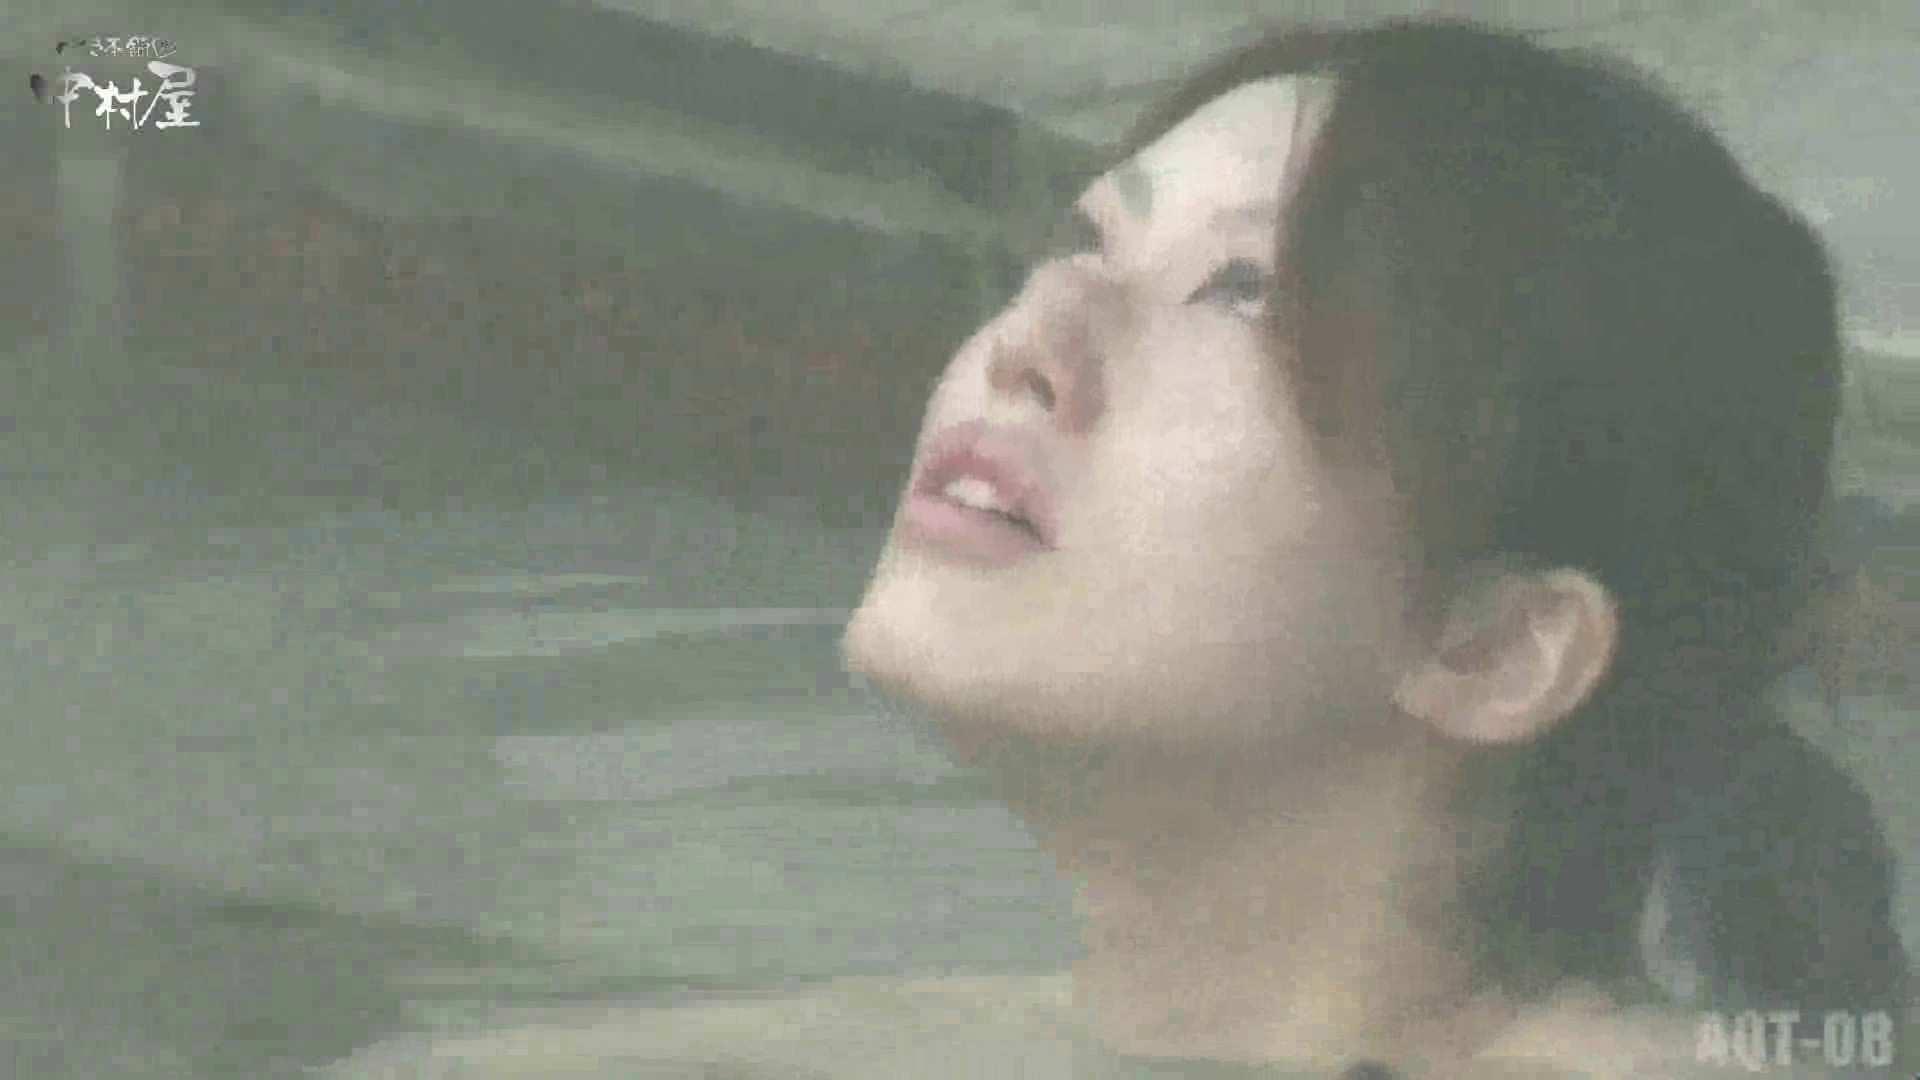 Aquaな露天風呂Vol.872潜入盗撮露天風呂八判湯 其の三 盗撮特集 | 潜入画像  96画像 48